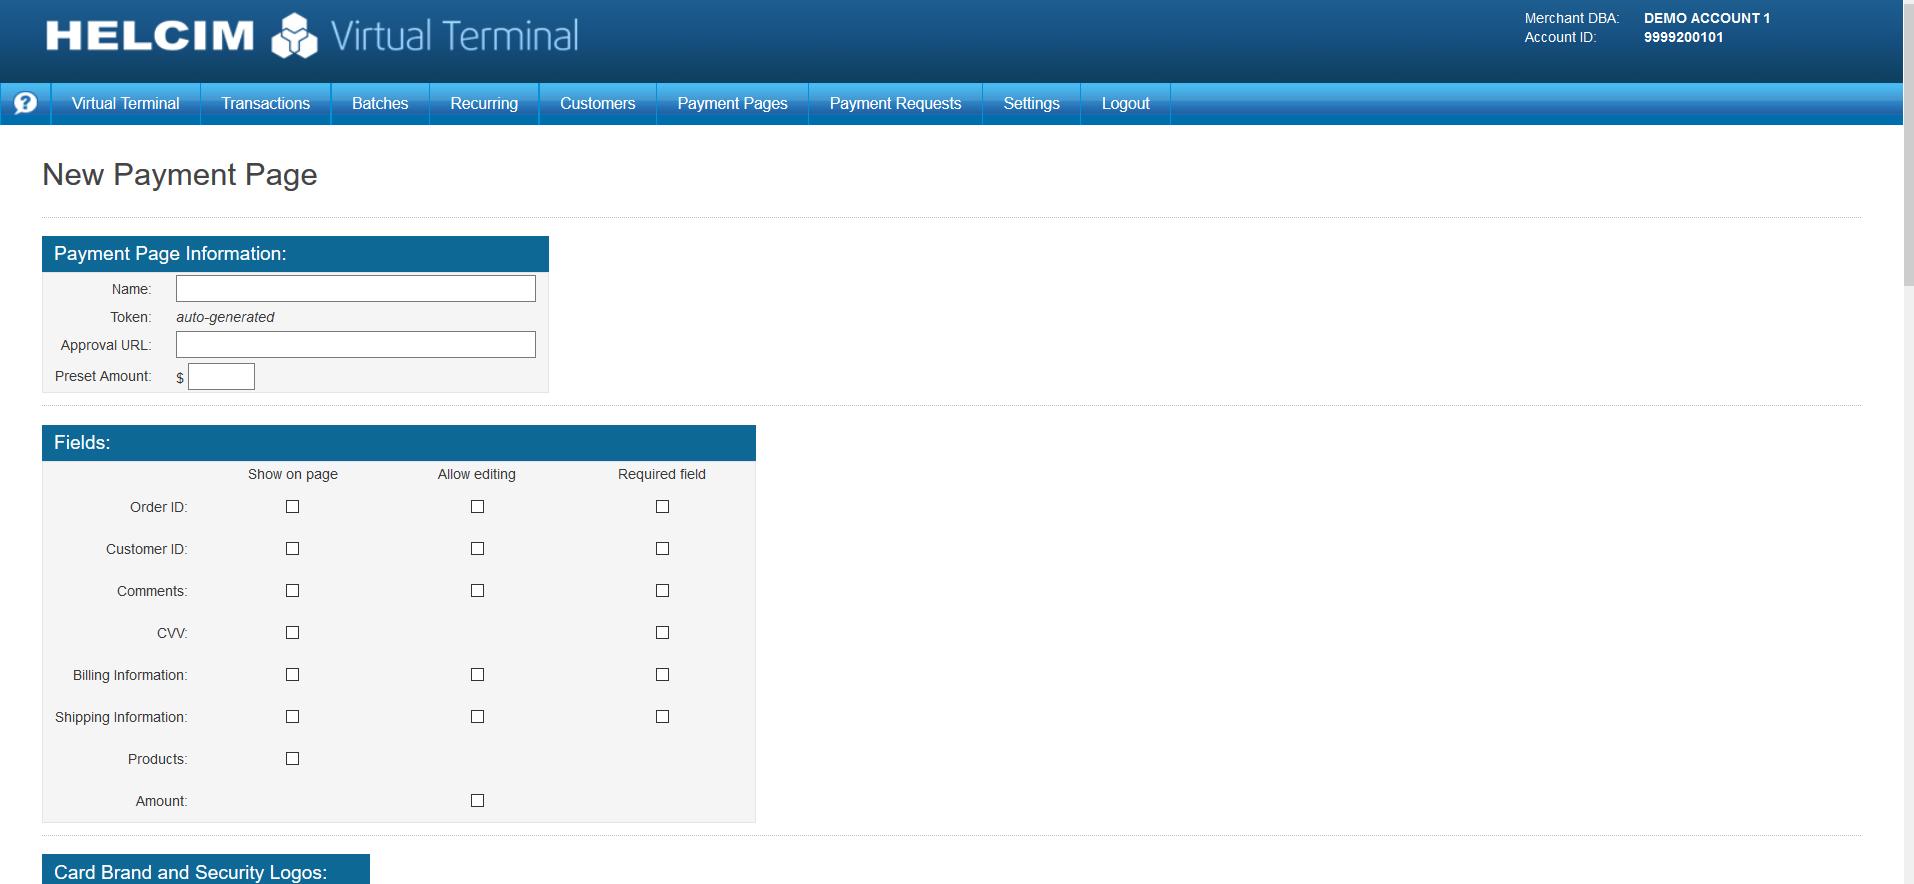 Helcim Commerce Demo - Virtual Terminal Payment Settings